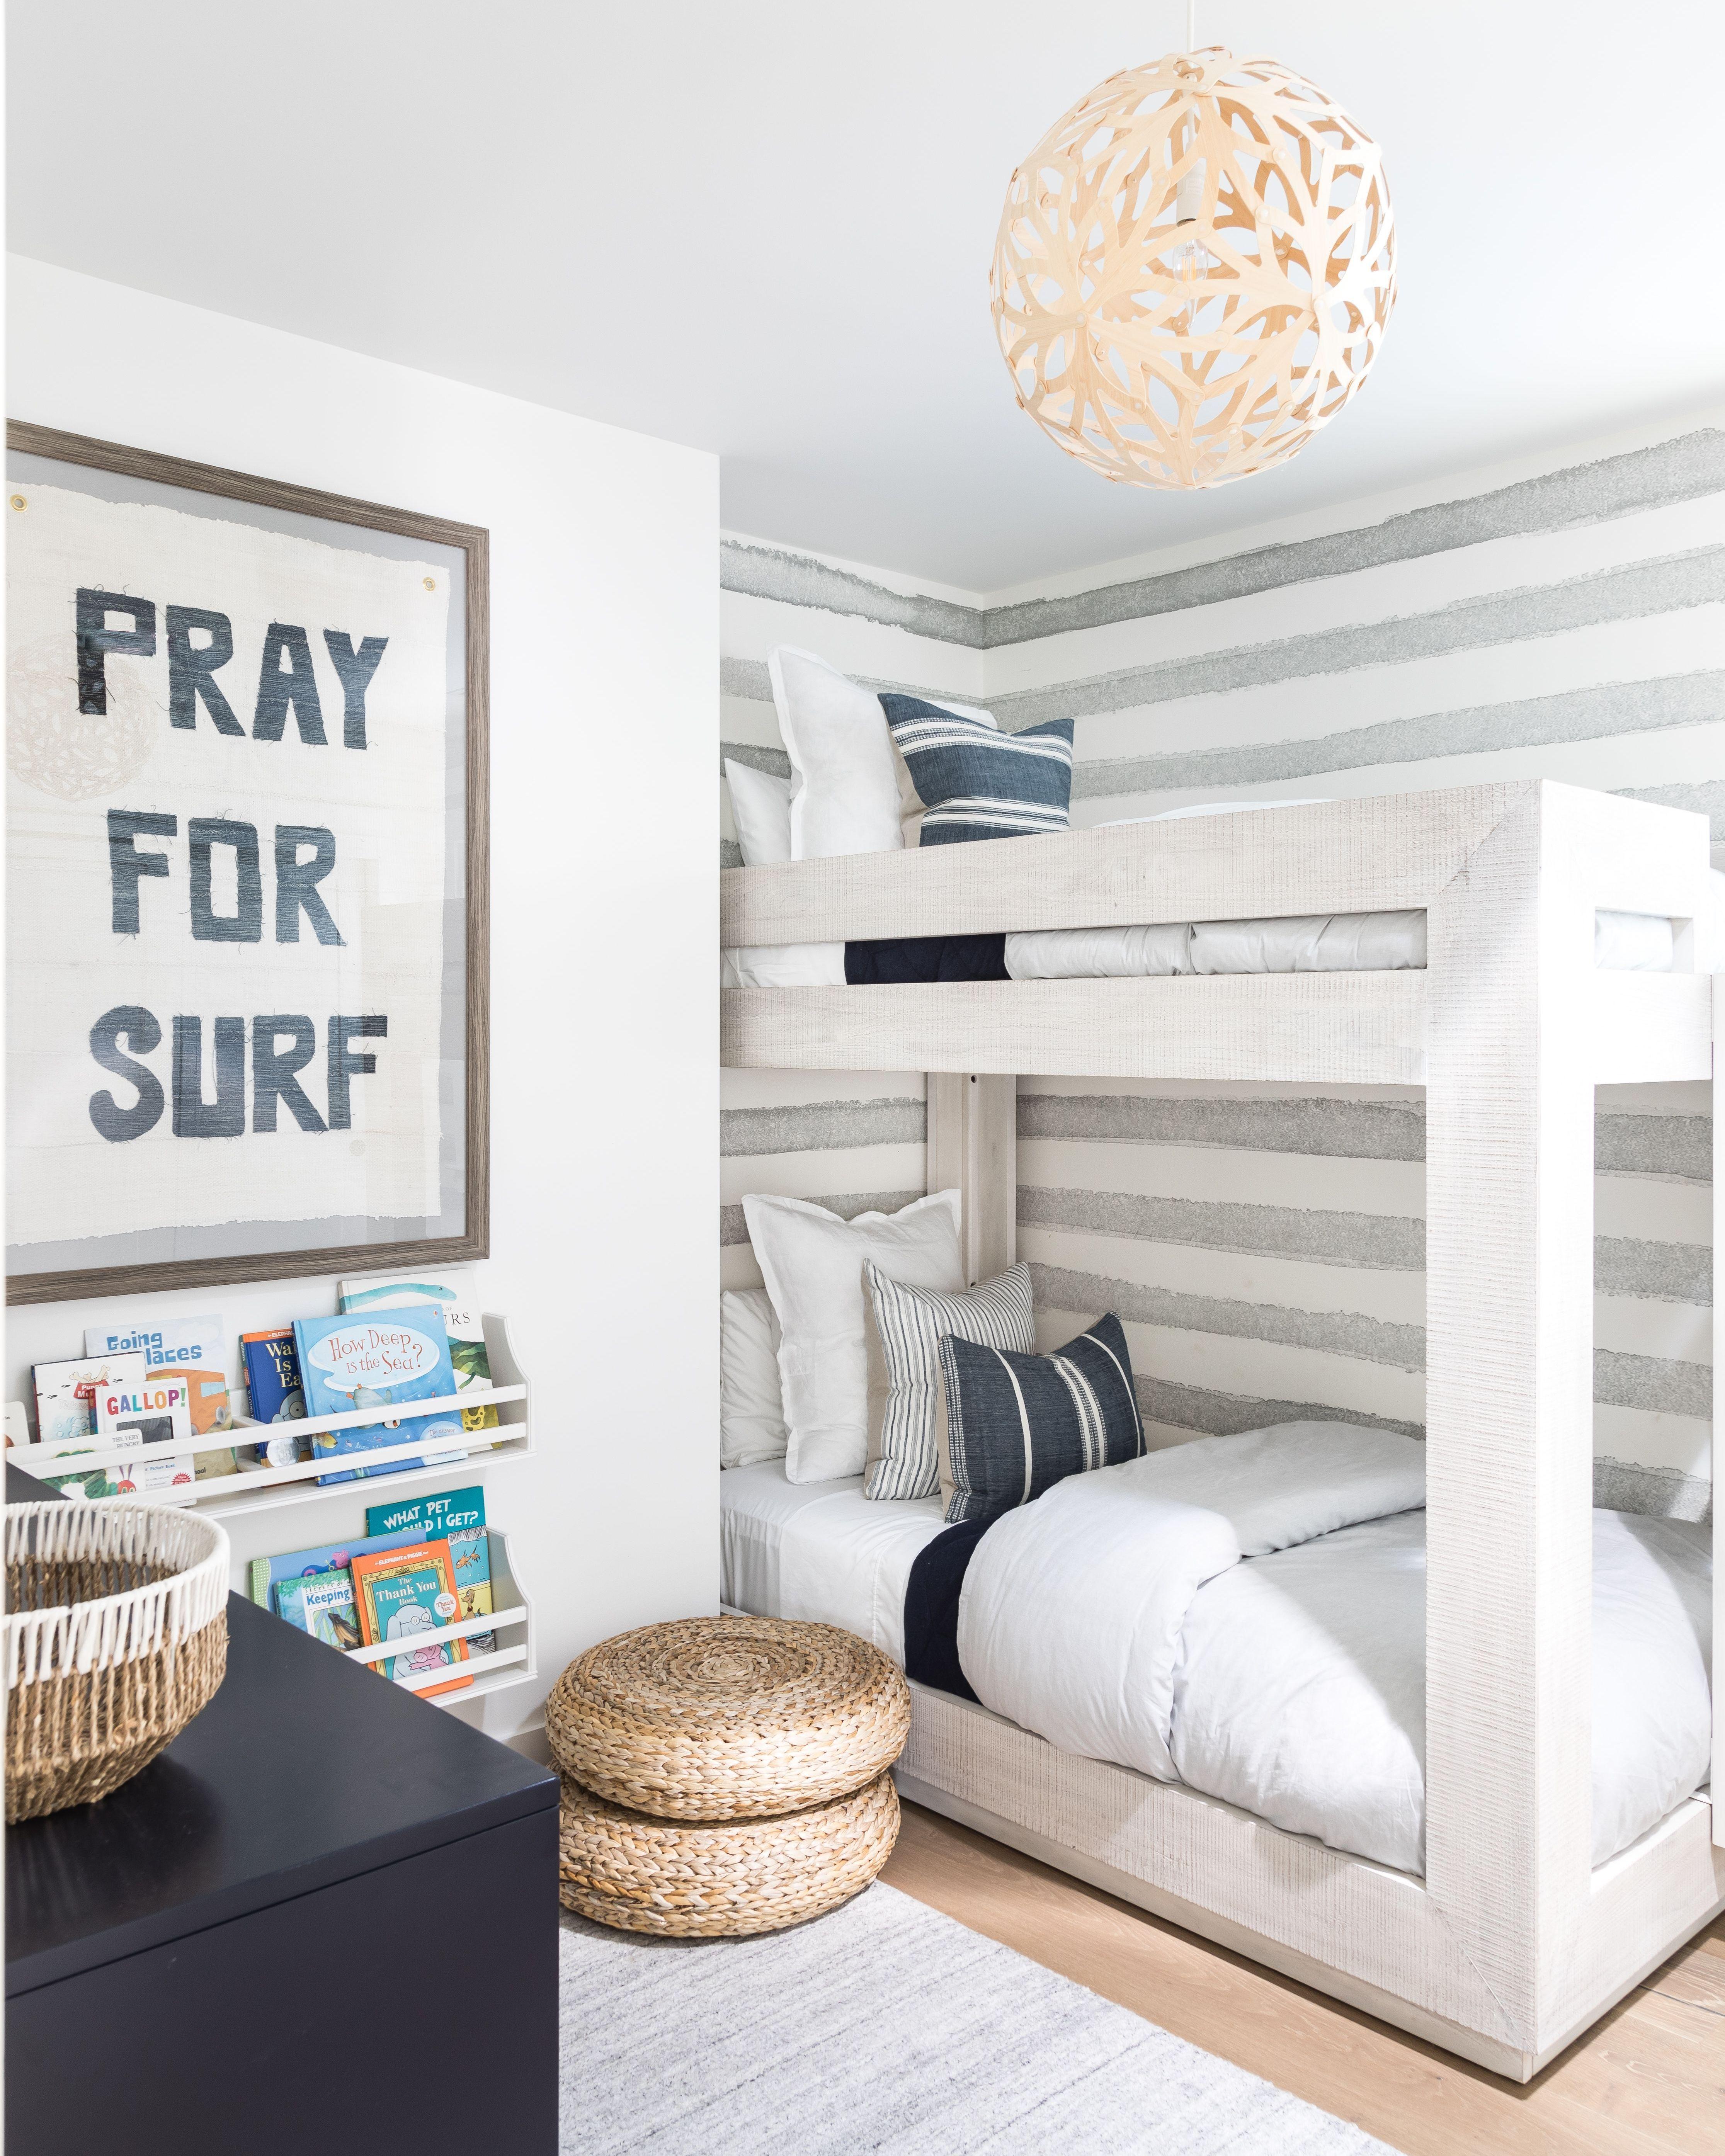 250 Little Ones Ideas In 2021 Nursery Room Design Colorful Kids Room Baby Room Decor